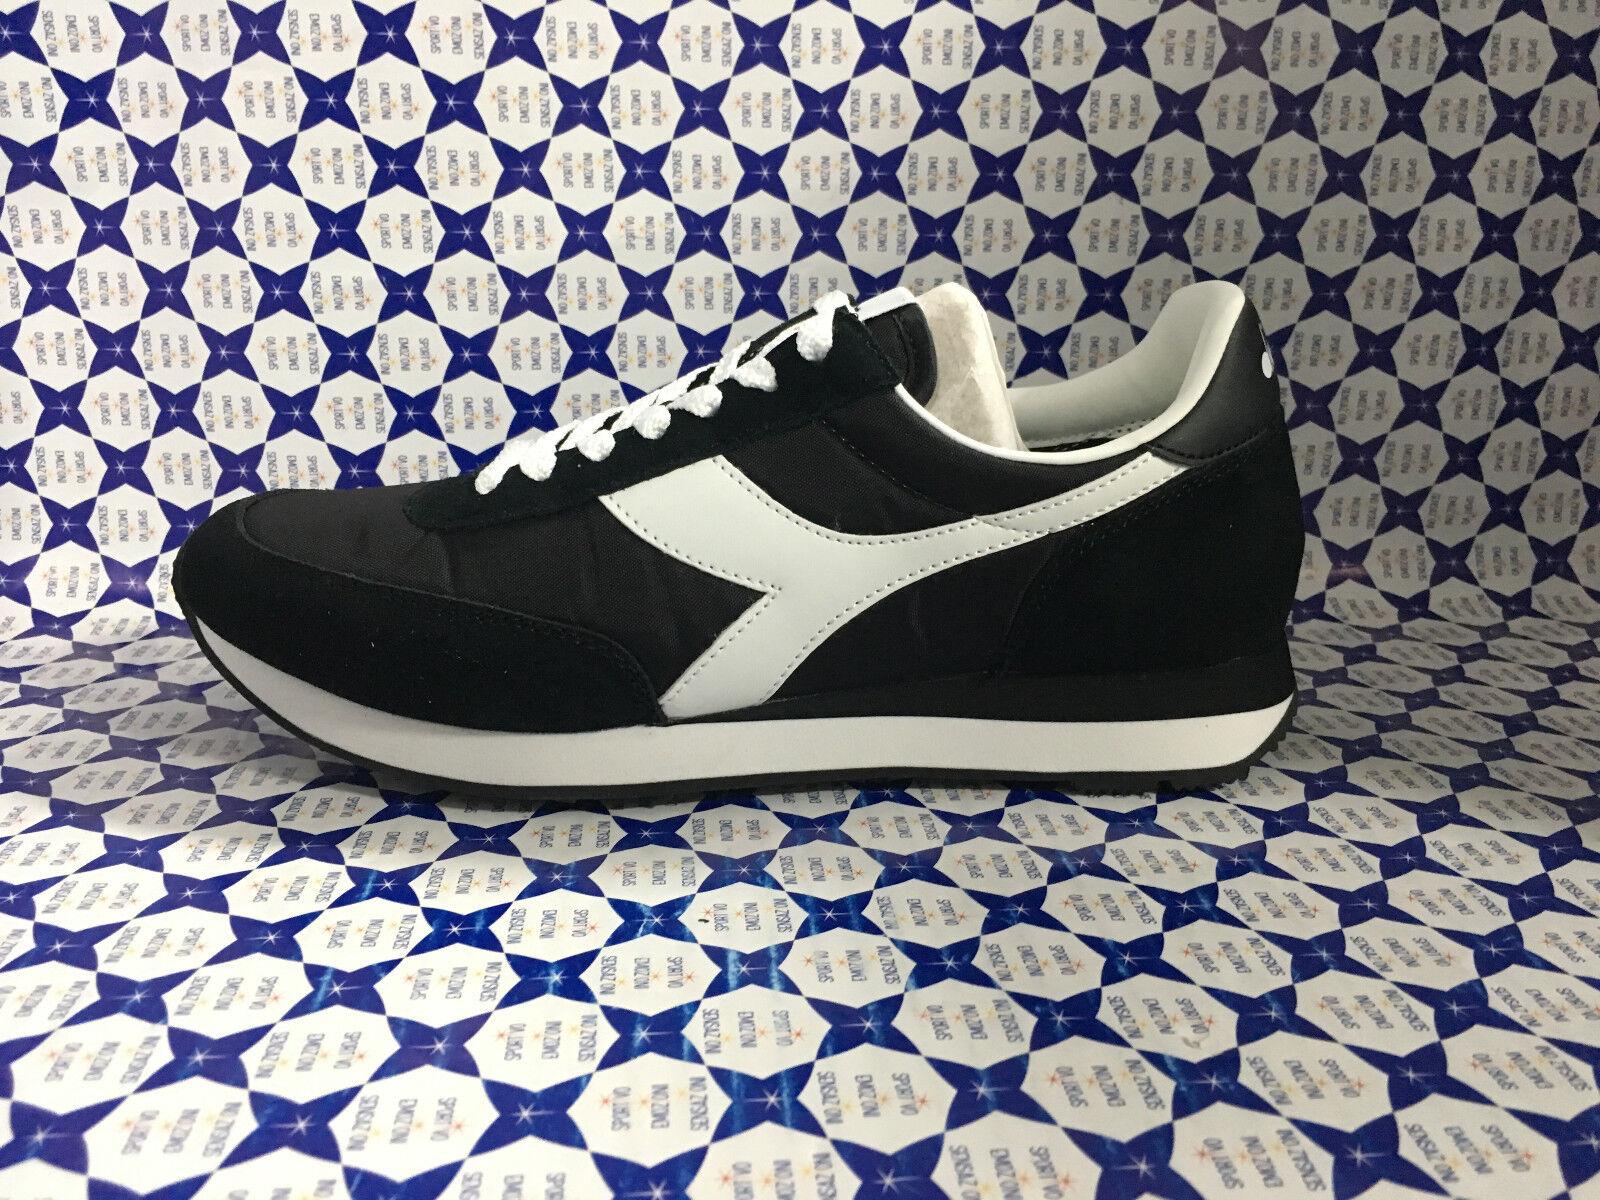 Scarpe Diadora - Uomo Sneakers - Koala - Diadora Nero Bianco - 173954 793b3a